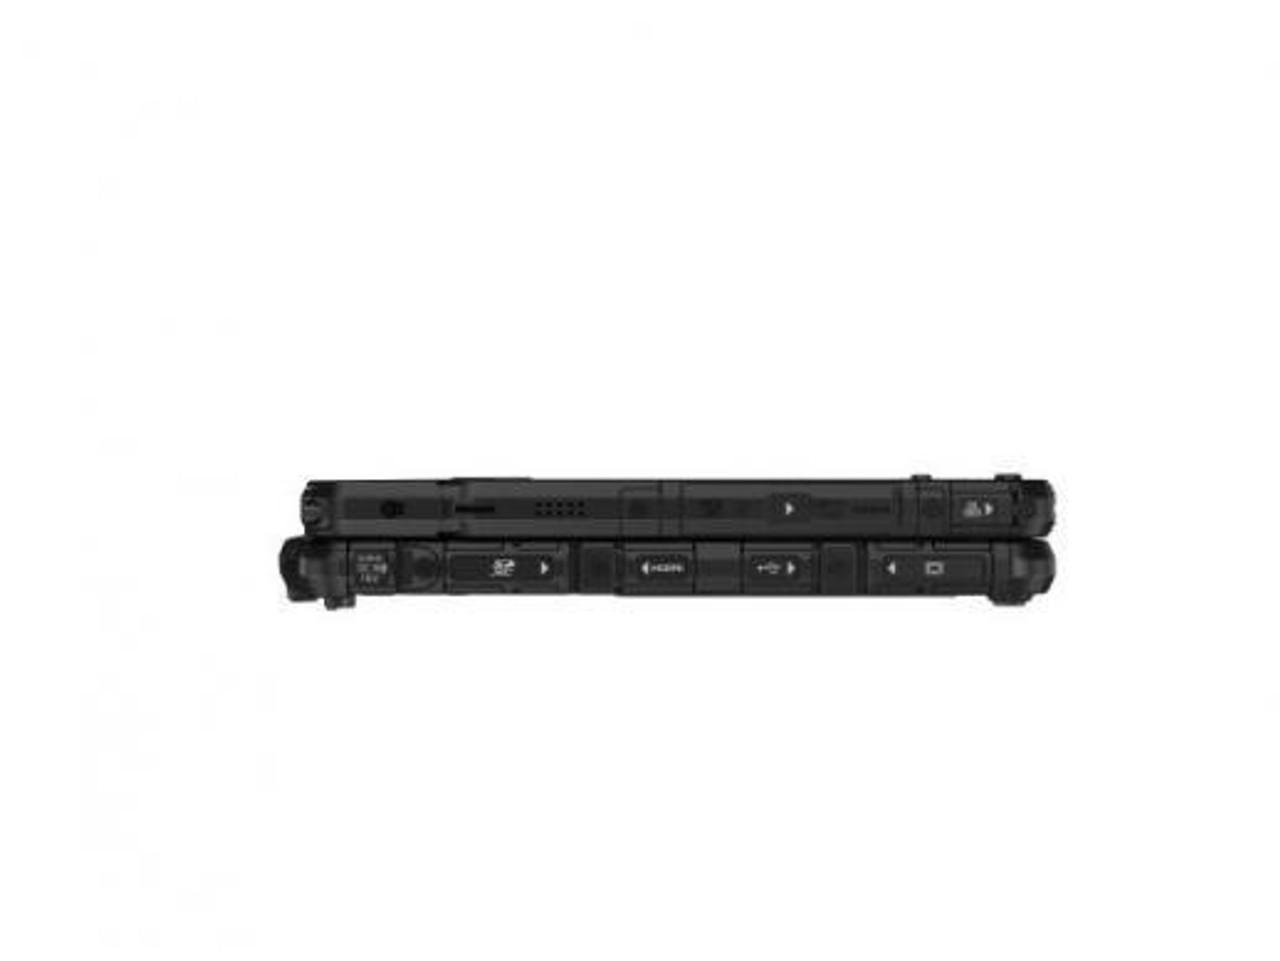 Panasonic Toughbook CF-20 ports 3